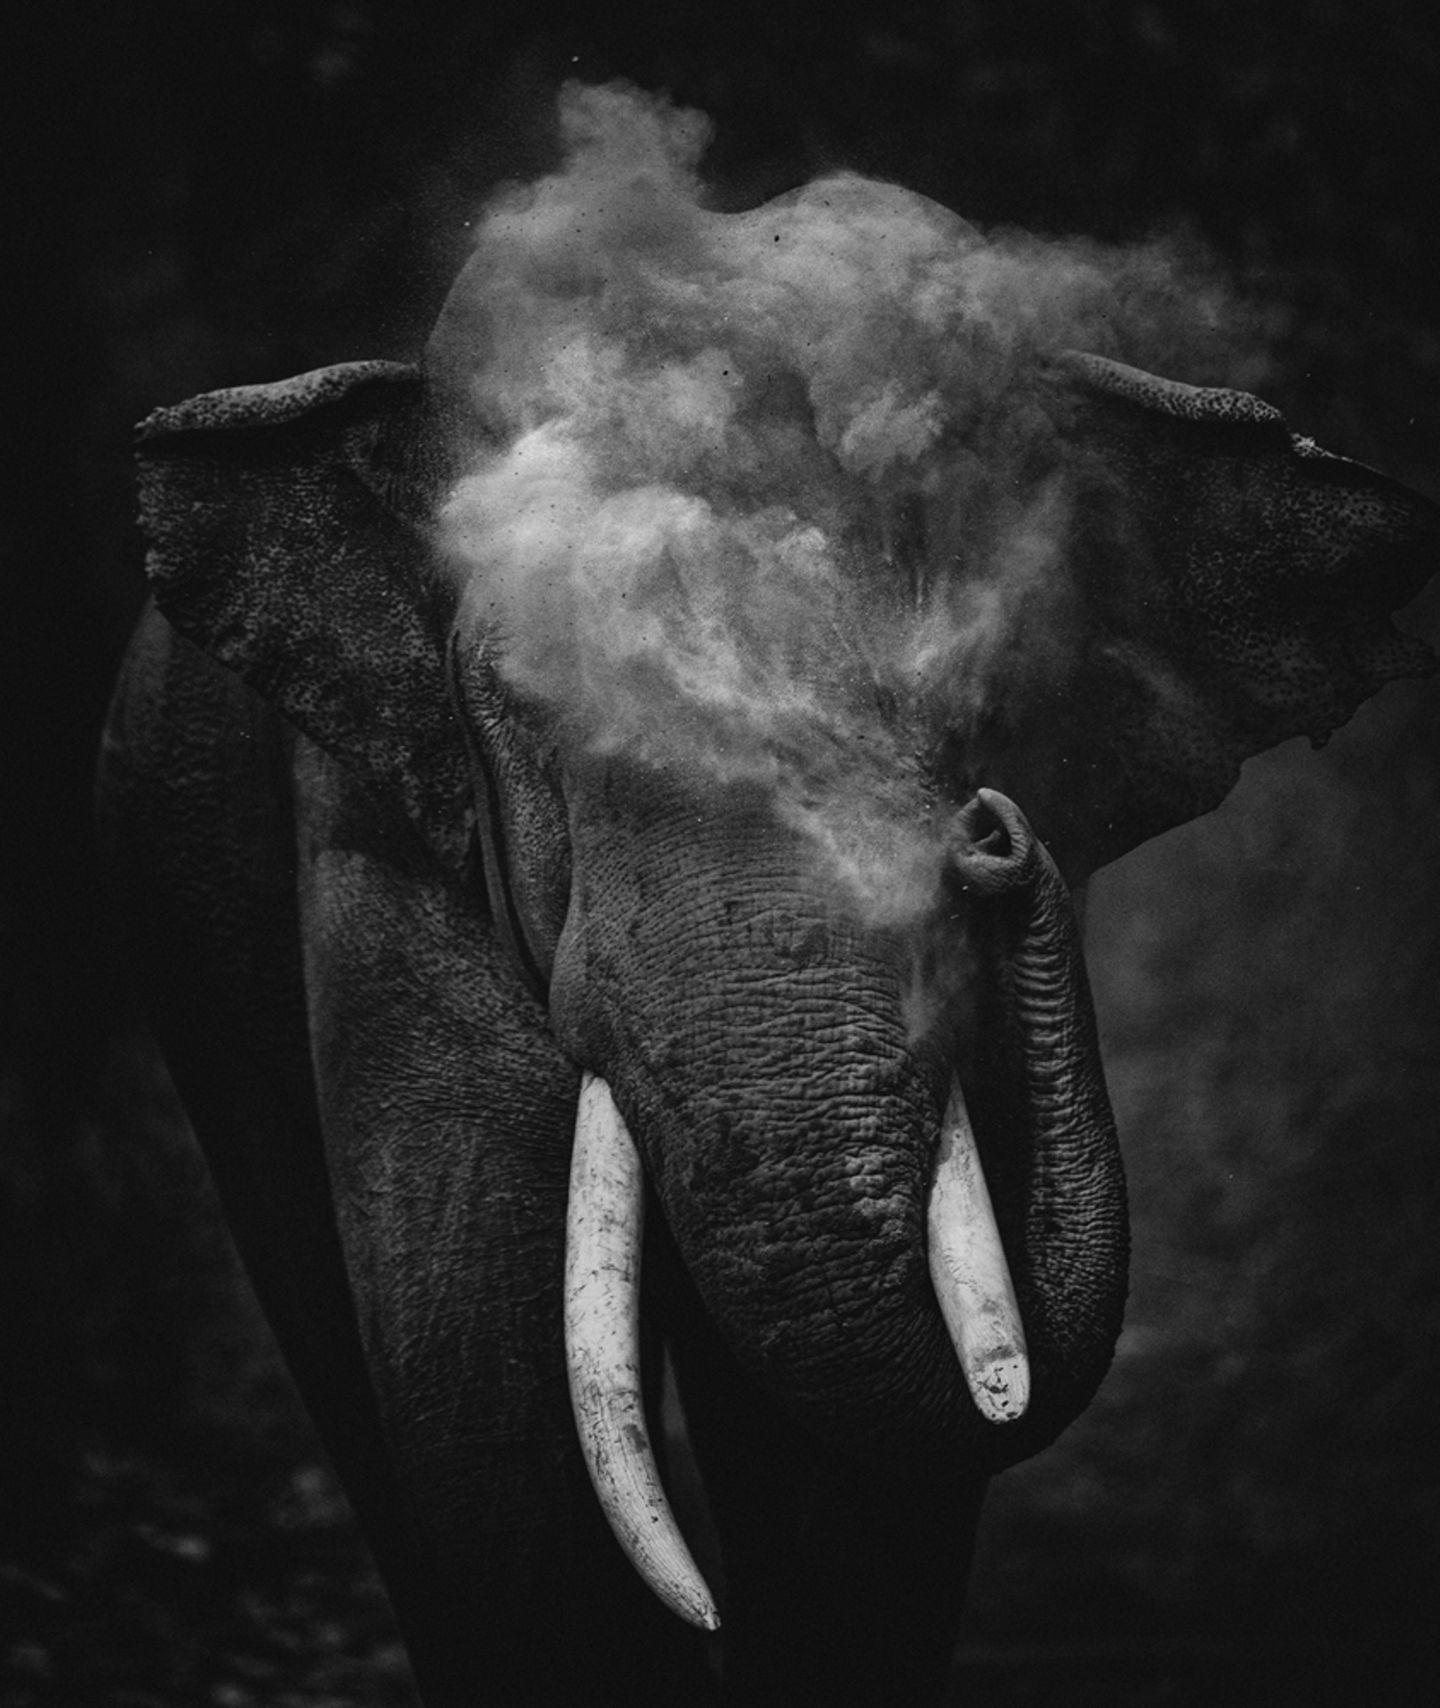 Sitara Karthikeyan/Nature inFocus Photograph of the Year